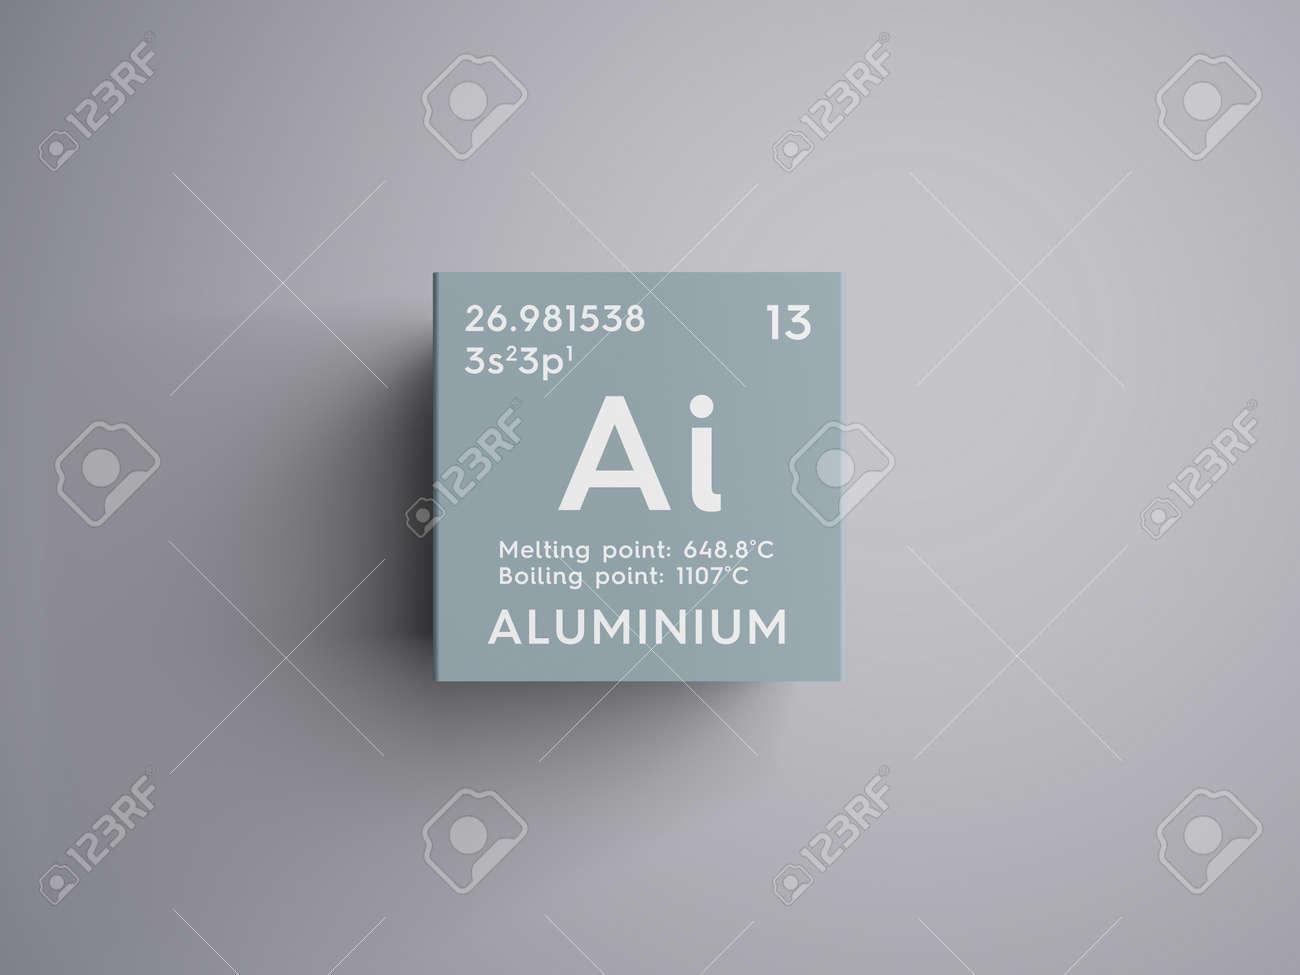 Aluminum Post Transition Metals Chemical Element Of Mendeleevs